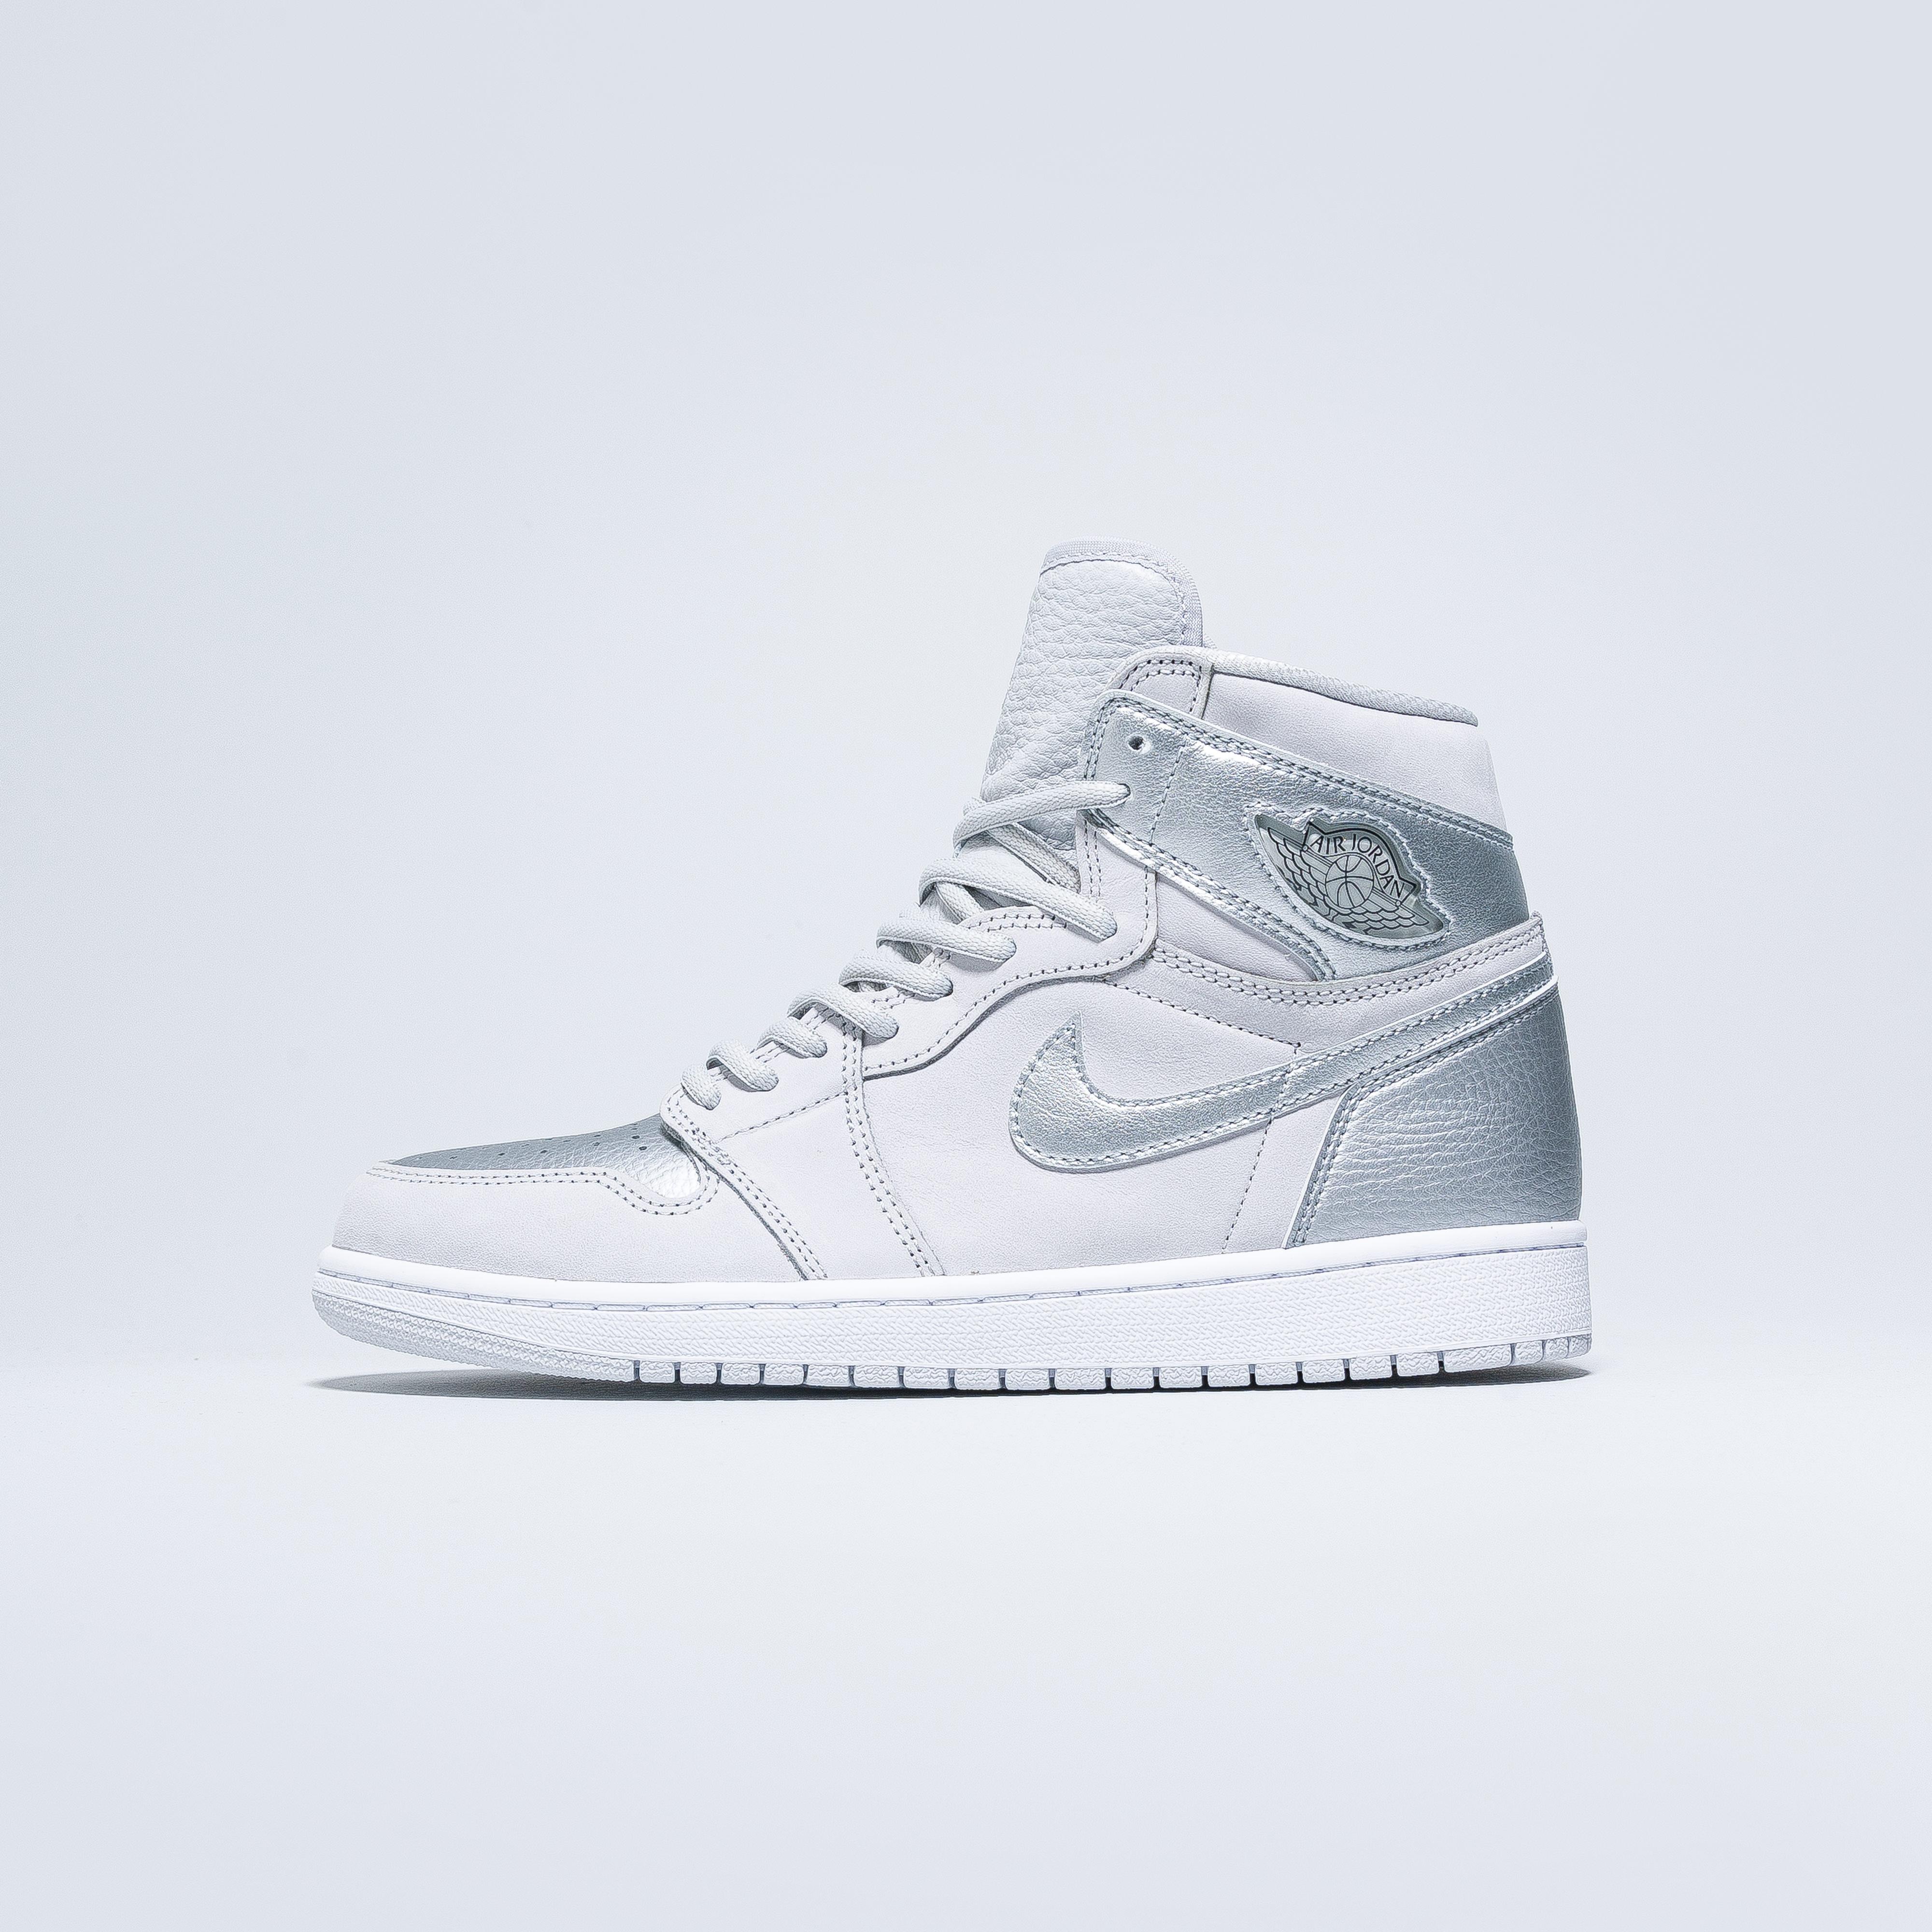 Jordan - Air Jordan 1 Hi OG CO.JP - Neutral Grey/Metallic Silver-White - Up There